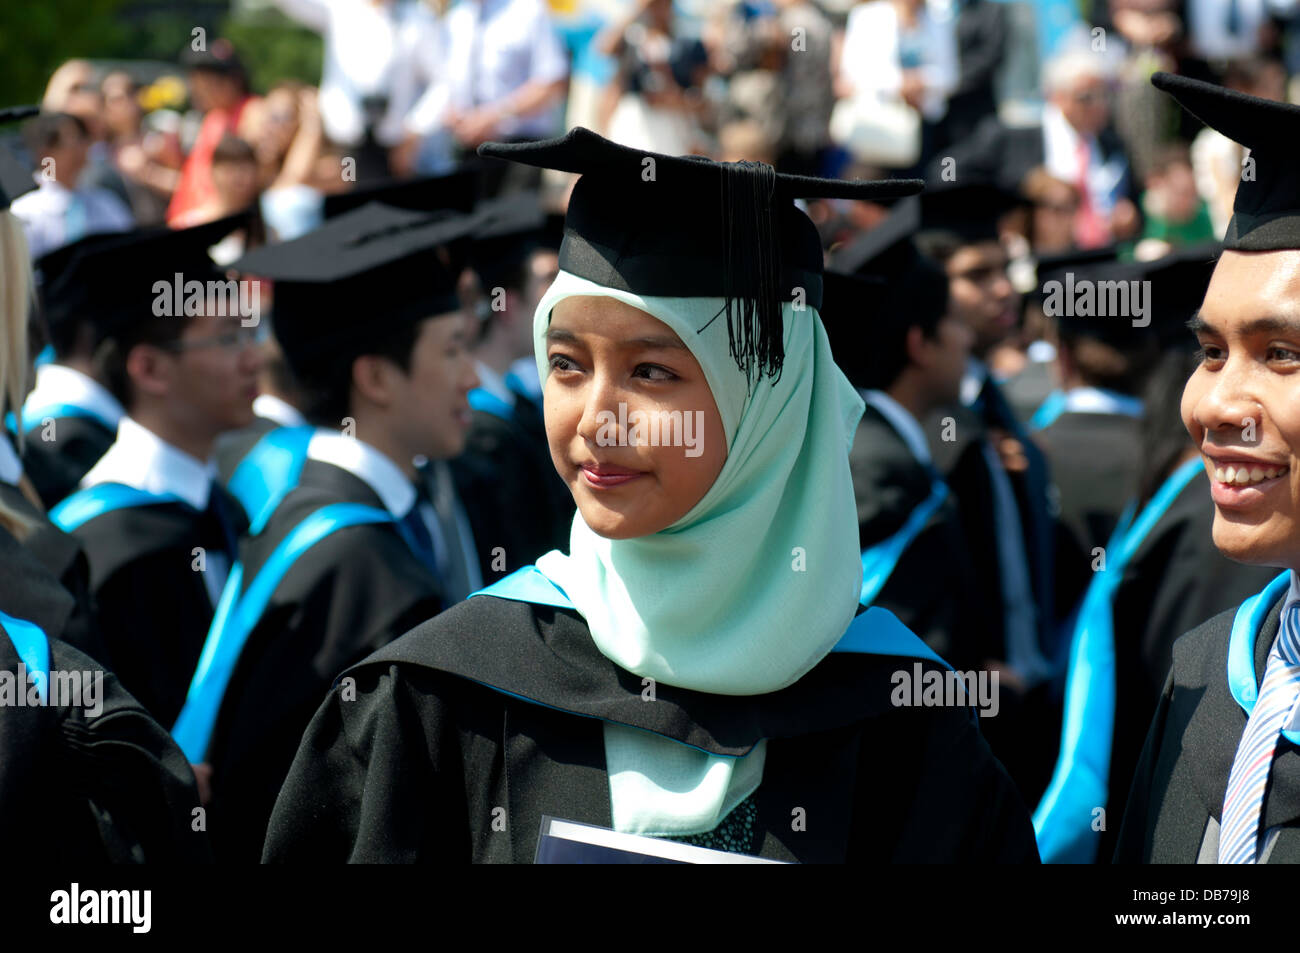 University of Warwick graduation day, UK - Stock Image